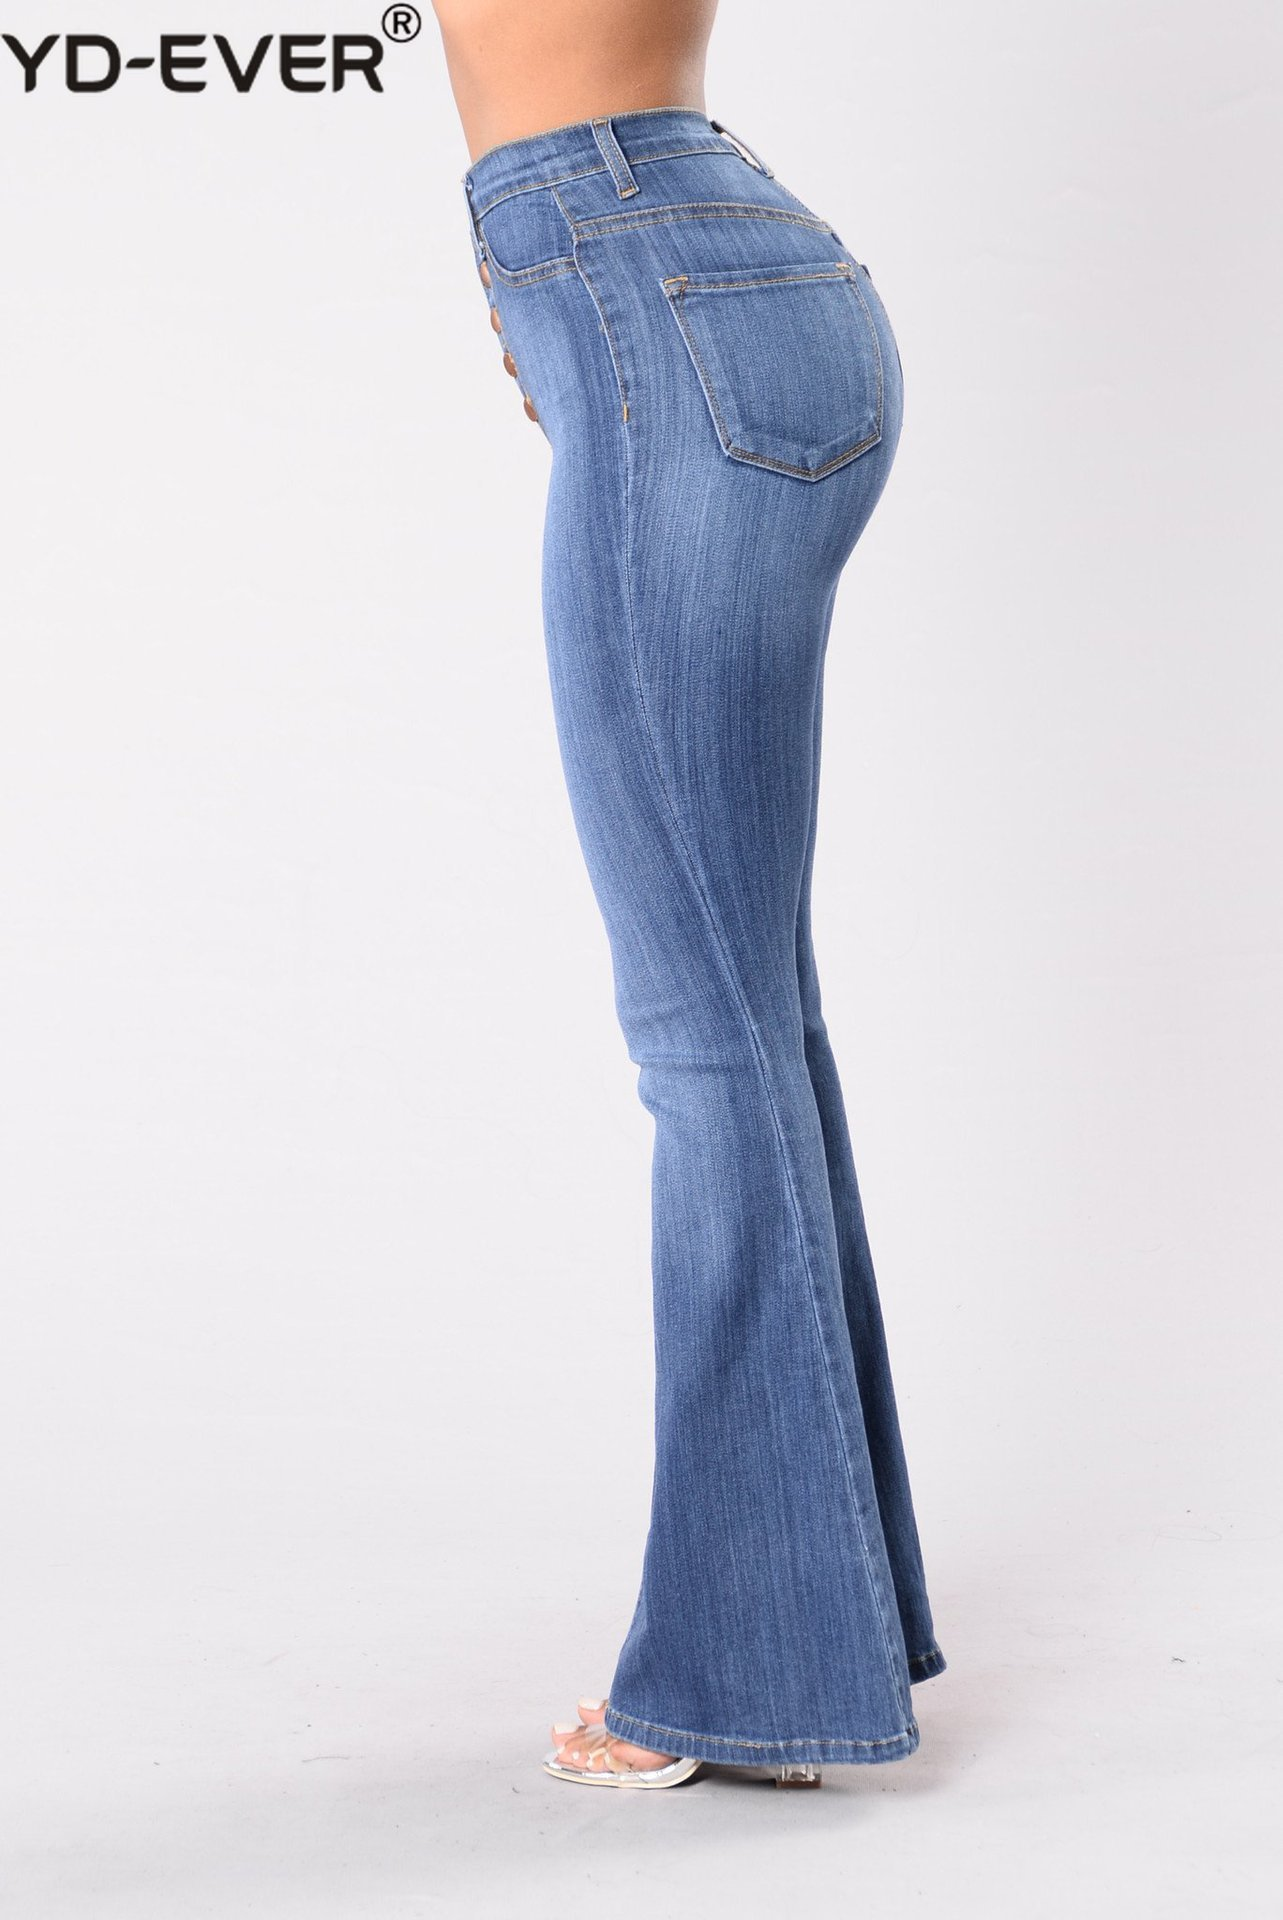 Longitud Completo Jeans Trasero Denim Talle Slim menta Beige Ancha Vintage Flaco De Flare Levantar Pantalón Alto Corte Pierna xqR8wzIpC